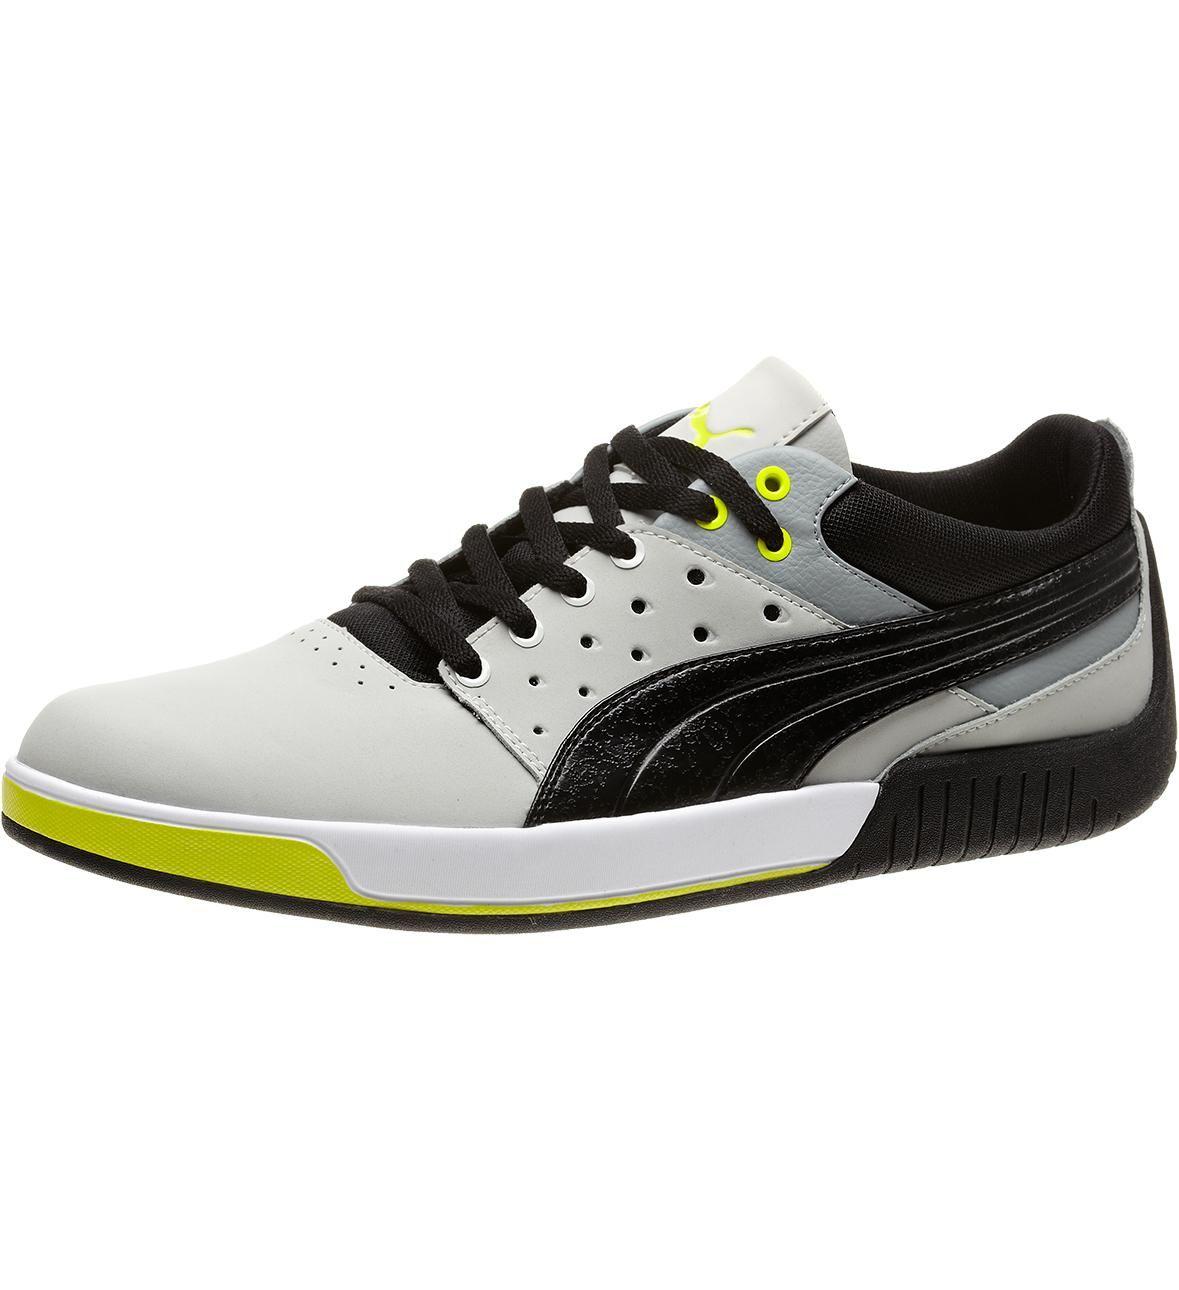 PUMA Global RallyCross GRC Street Low Shoes | Indiaviolet Shops,$70.00